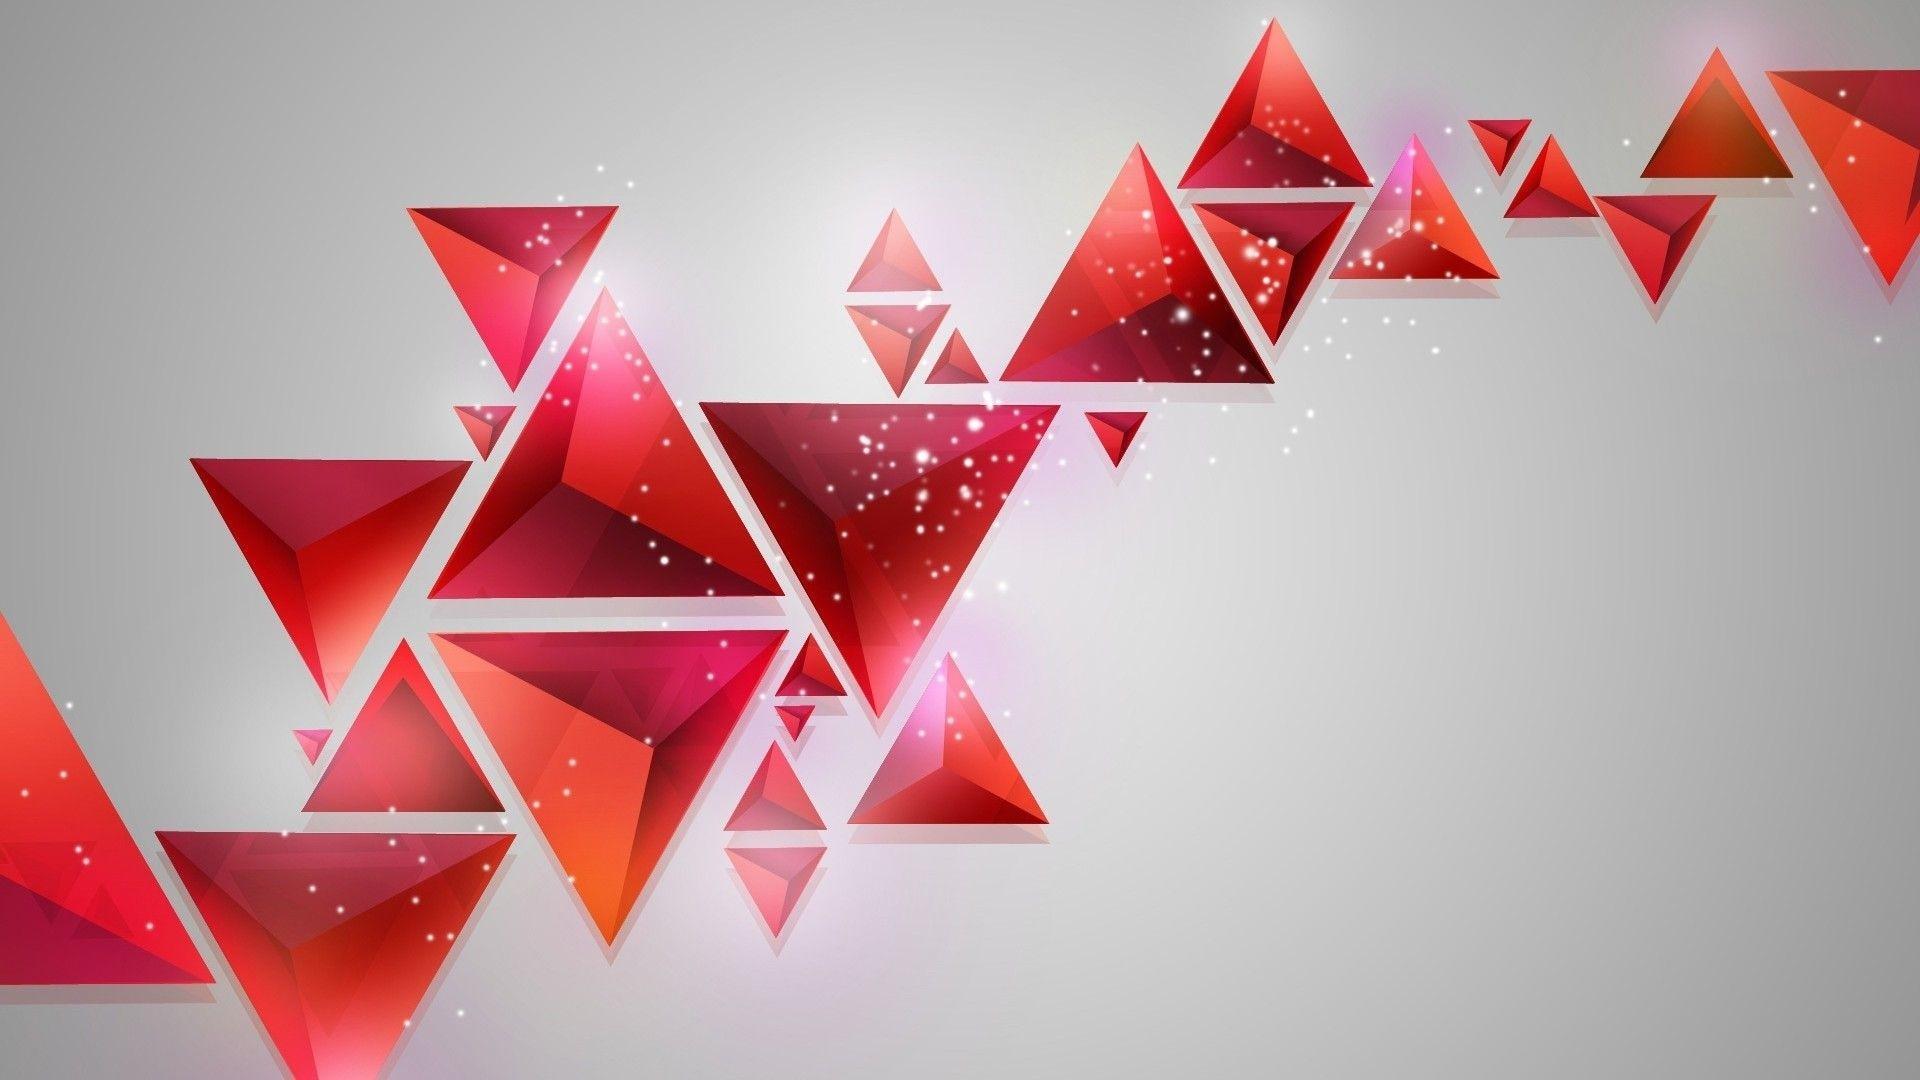 Geometric Background Wallpaper